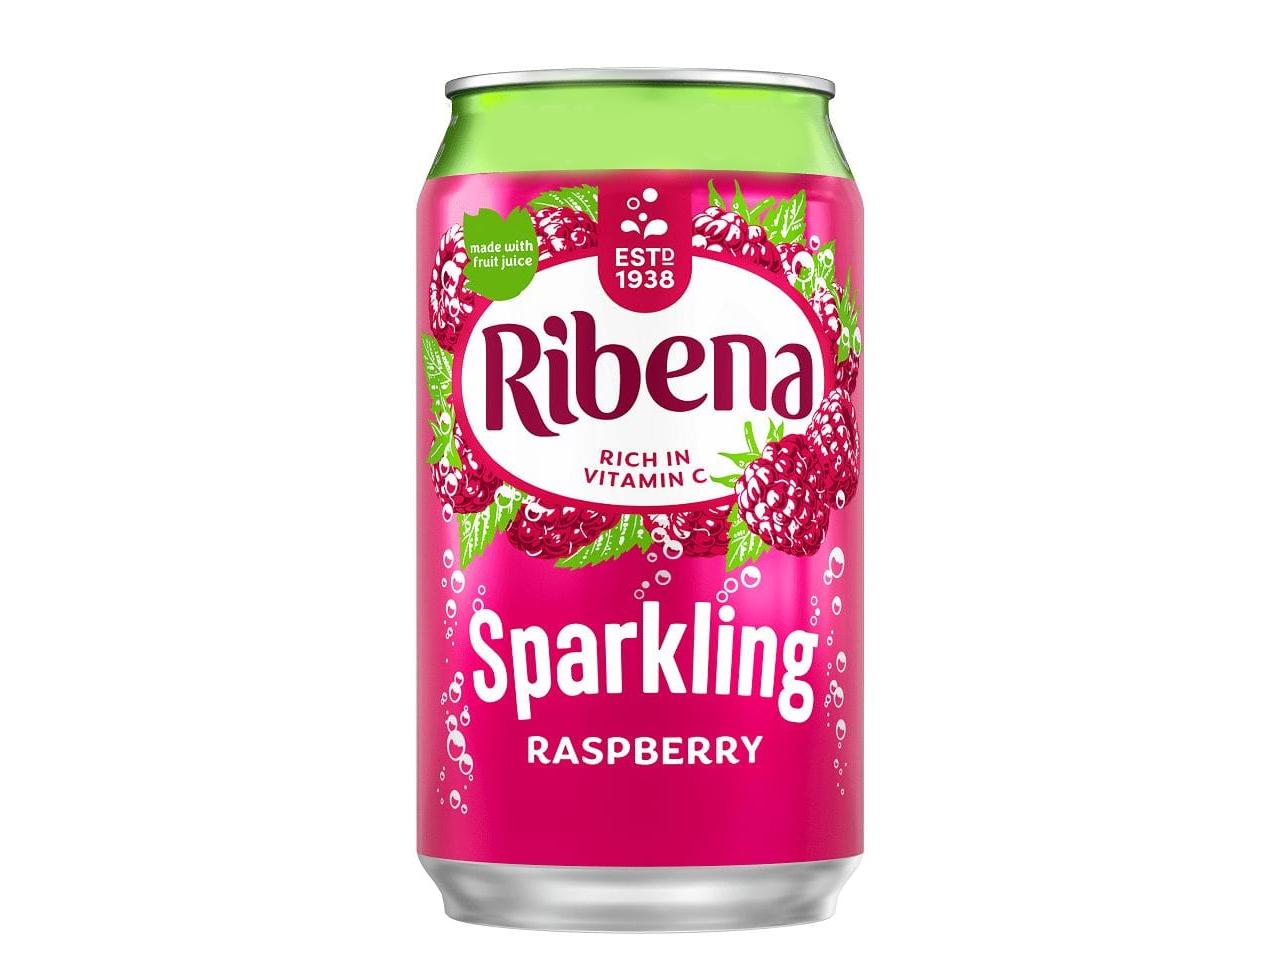 Ribena Sparkling Raspberry